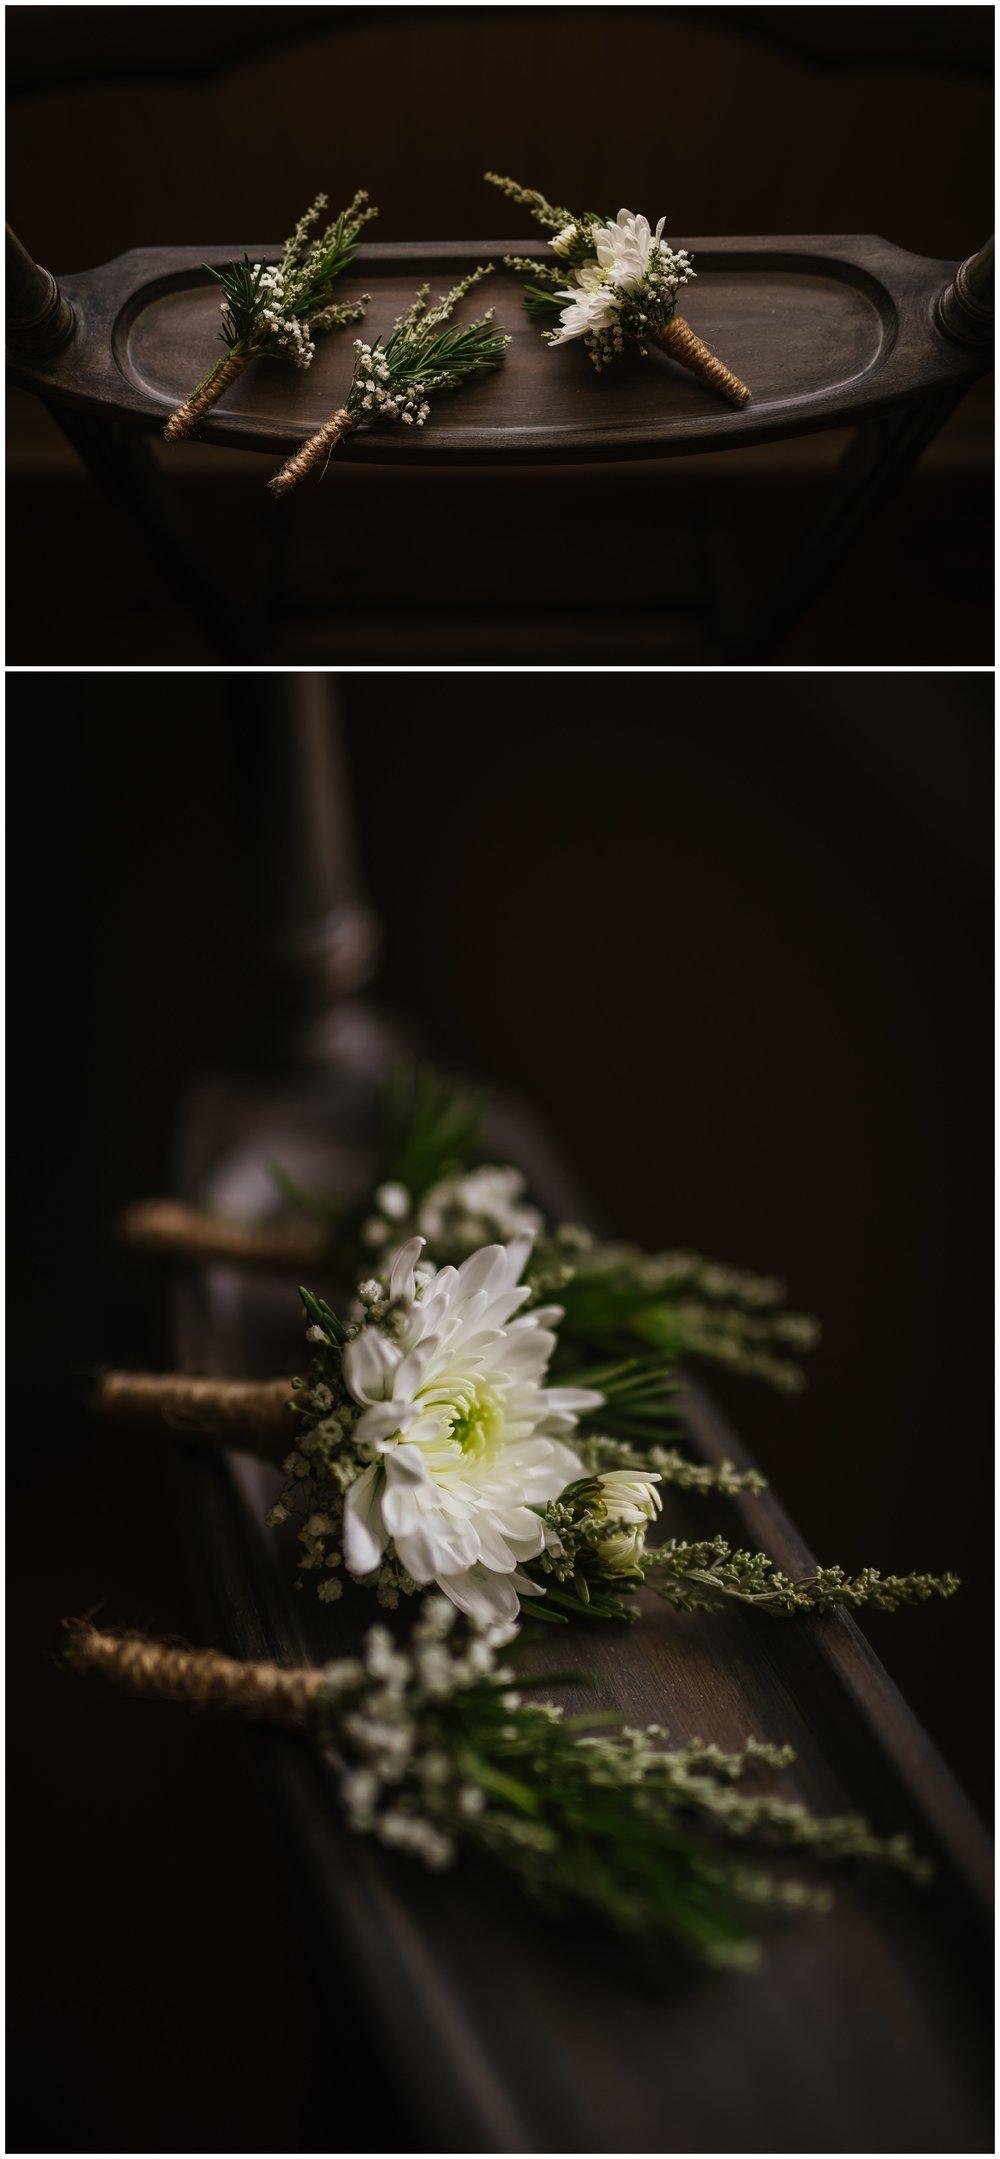 Cross-creek-ranch-navy-bush-tampa-wedding-photogrpaher_0013.jpg